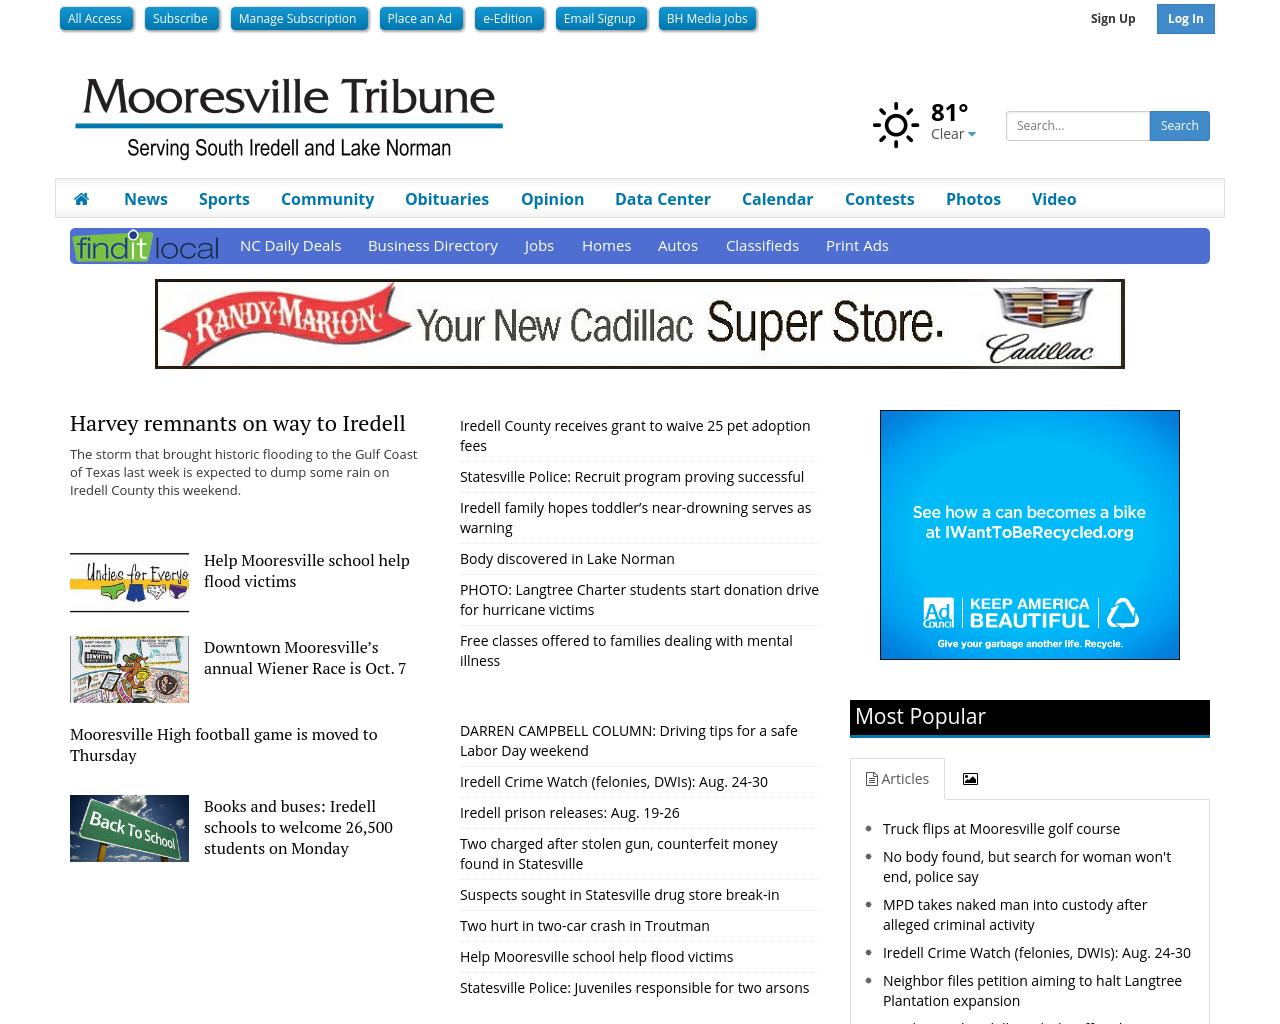 Mooresville-Tribune-Advertising-Reviews-Pricing